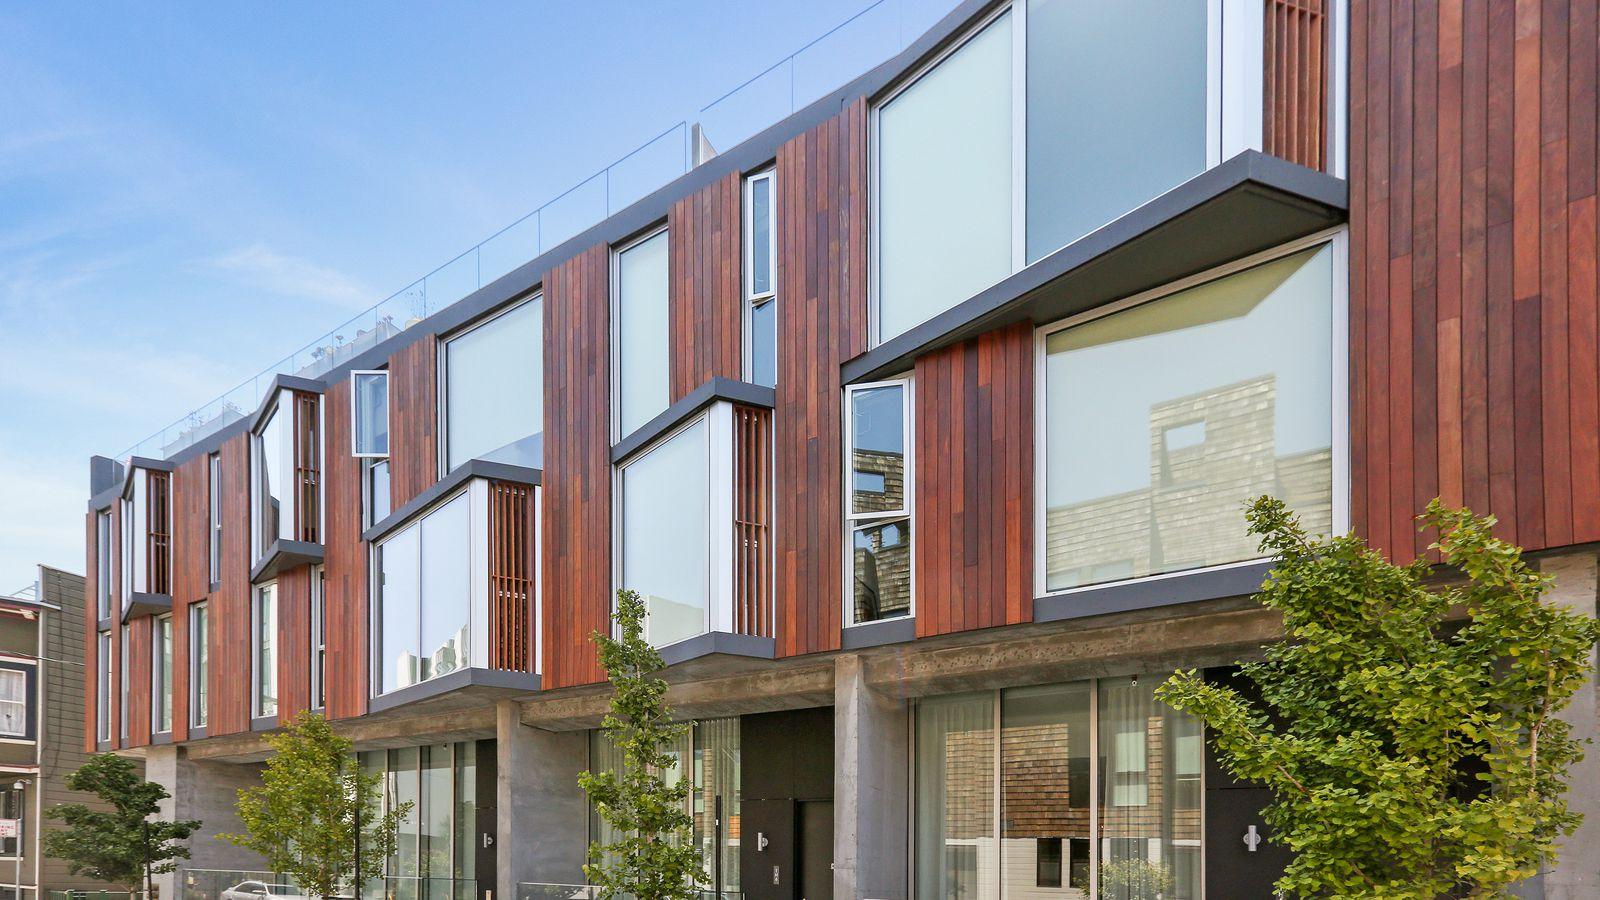 Handel Architects-designed Hayes Valley loft asks $1.5 million